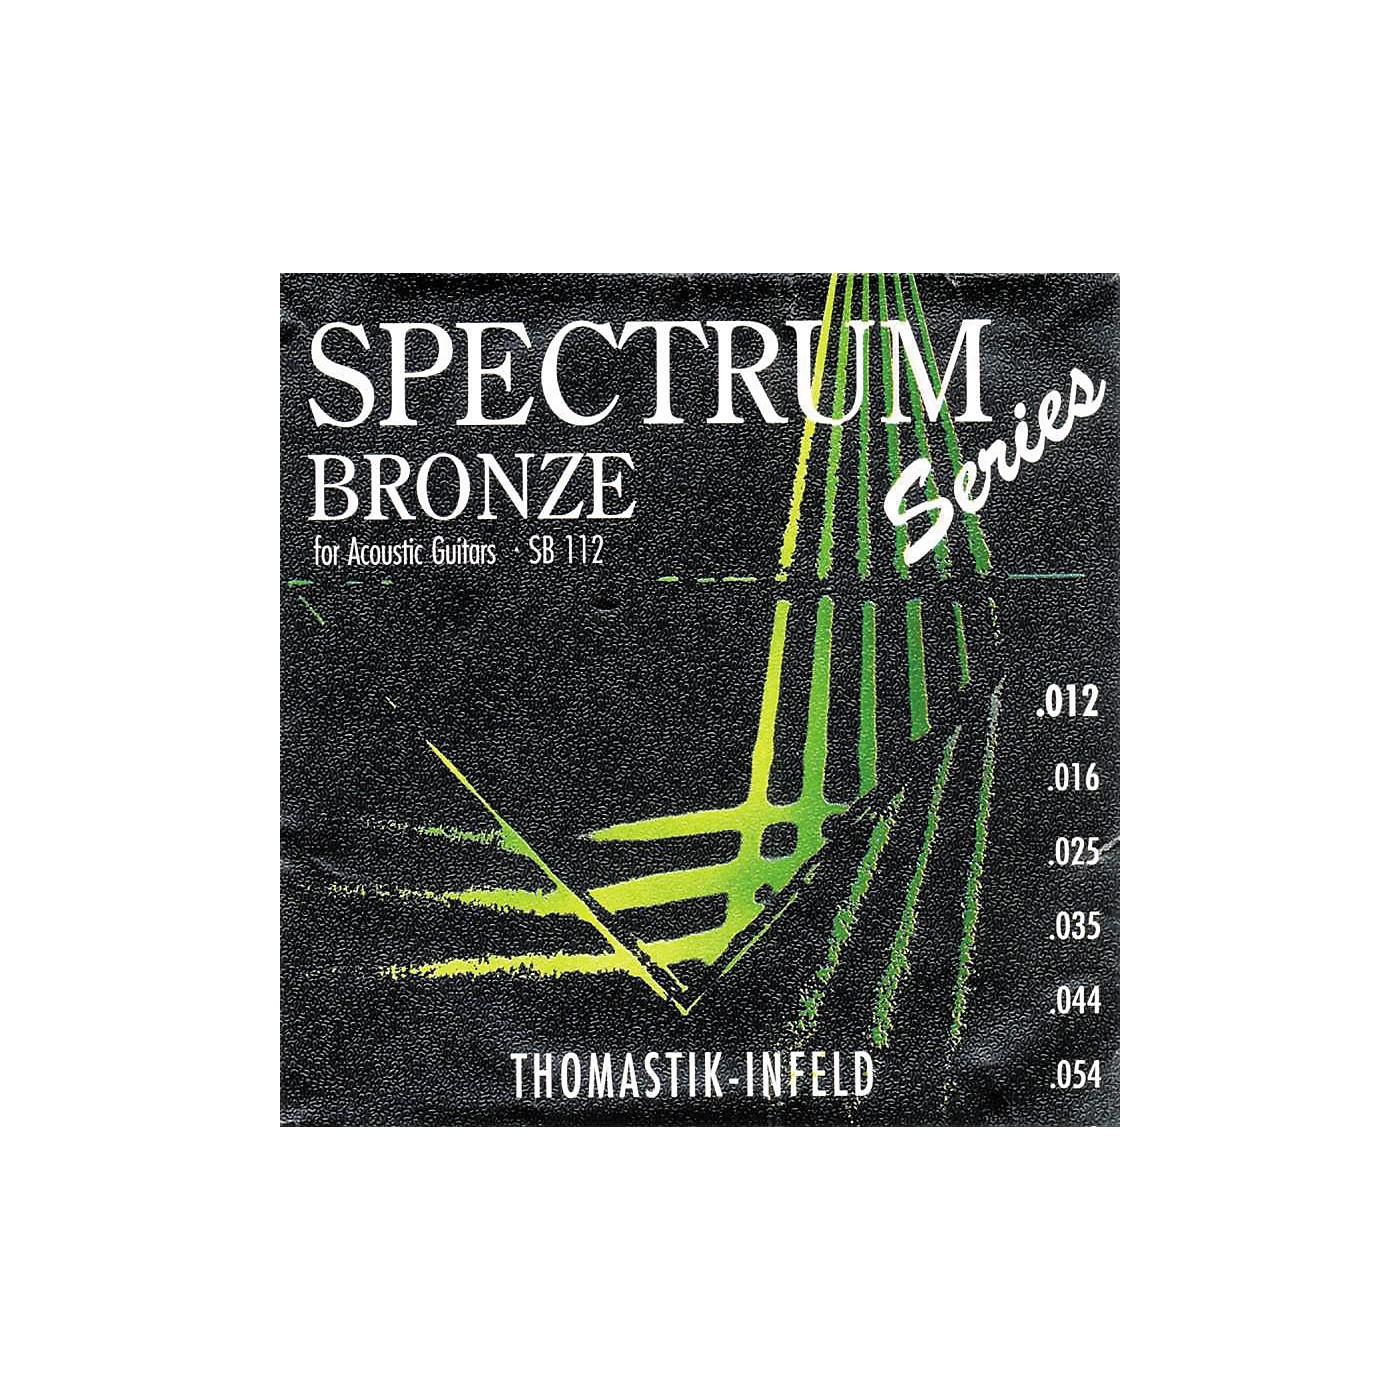 Thomastik SB112 Spectrum Bronze Acoustic Strings Medium-Light thumbnail